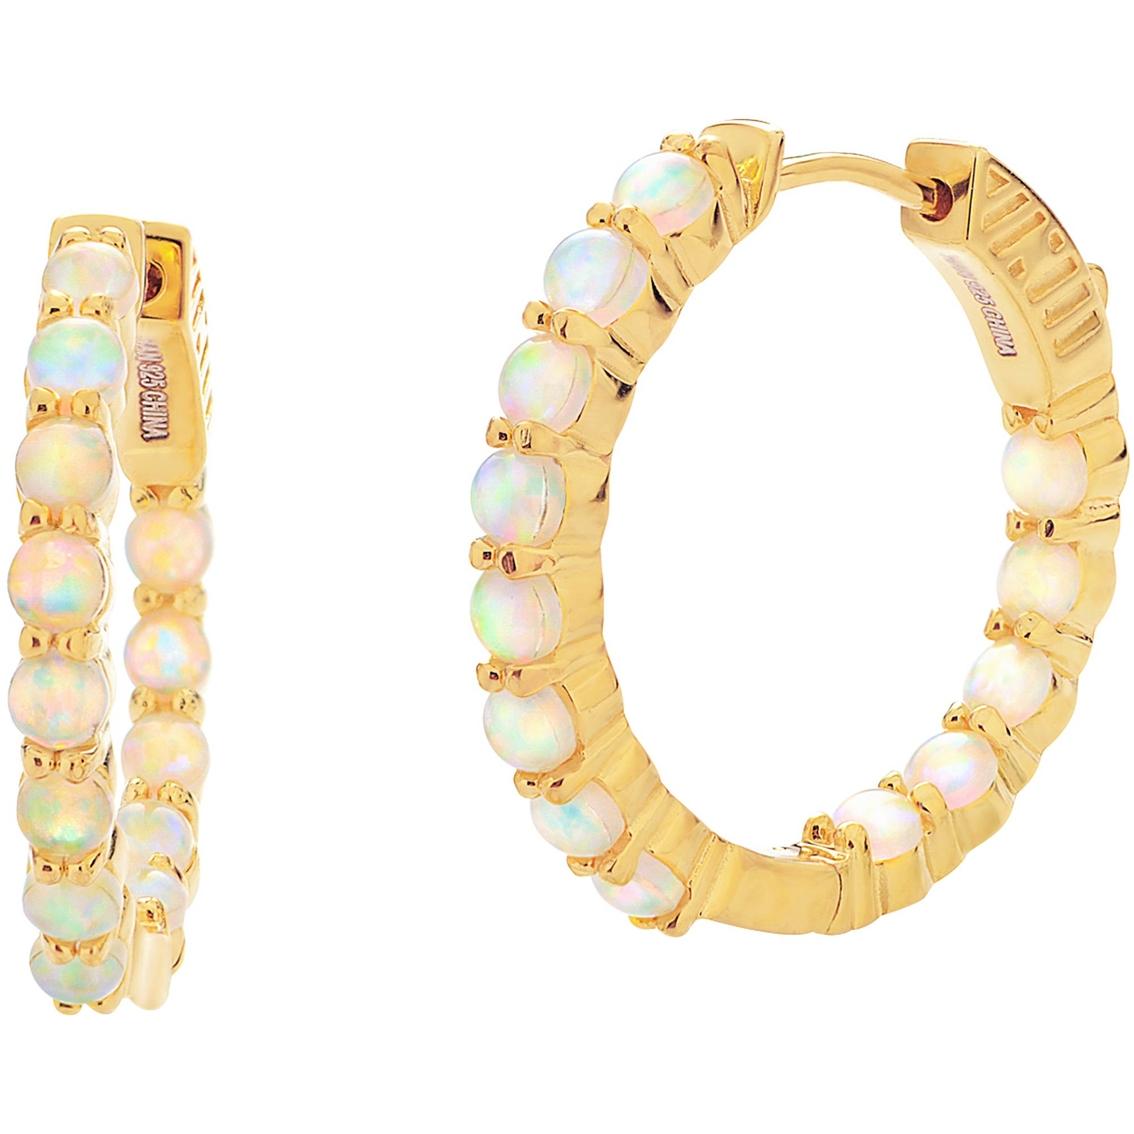 0de6ce6f0 18k Gold Over Sterling Silver Lab Created Opal Endless Hoop Earrings ...